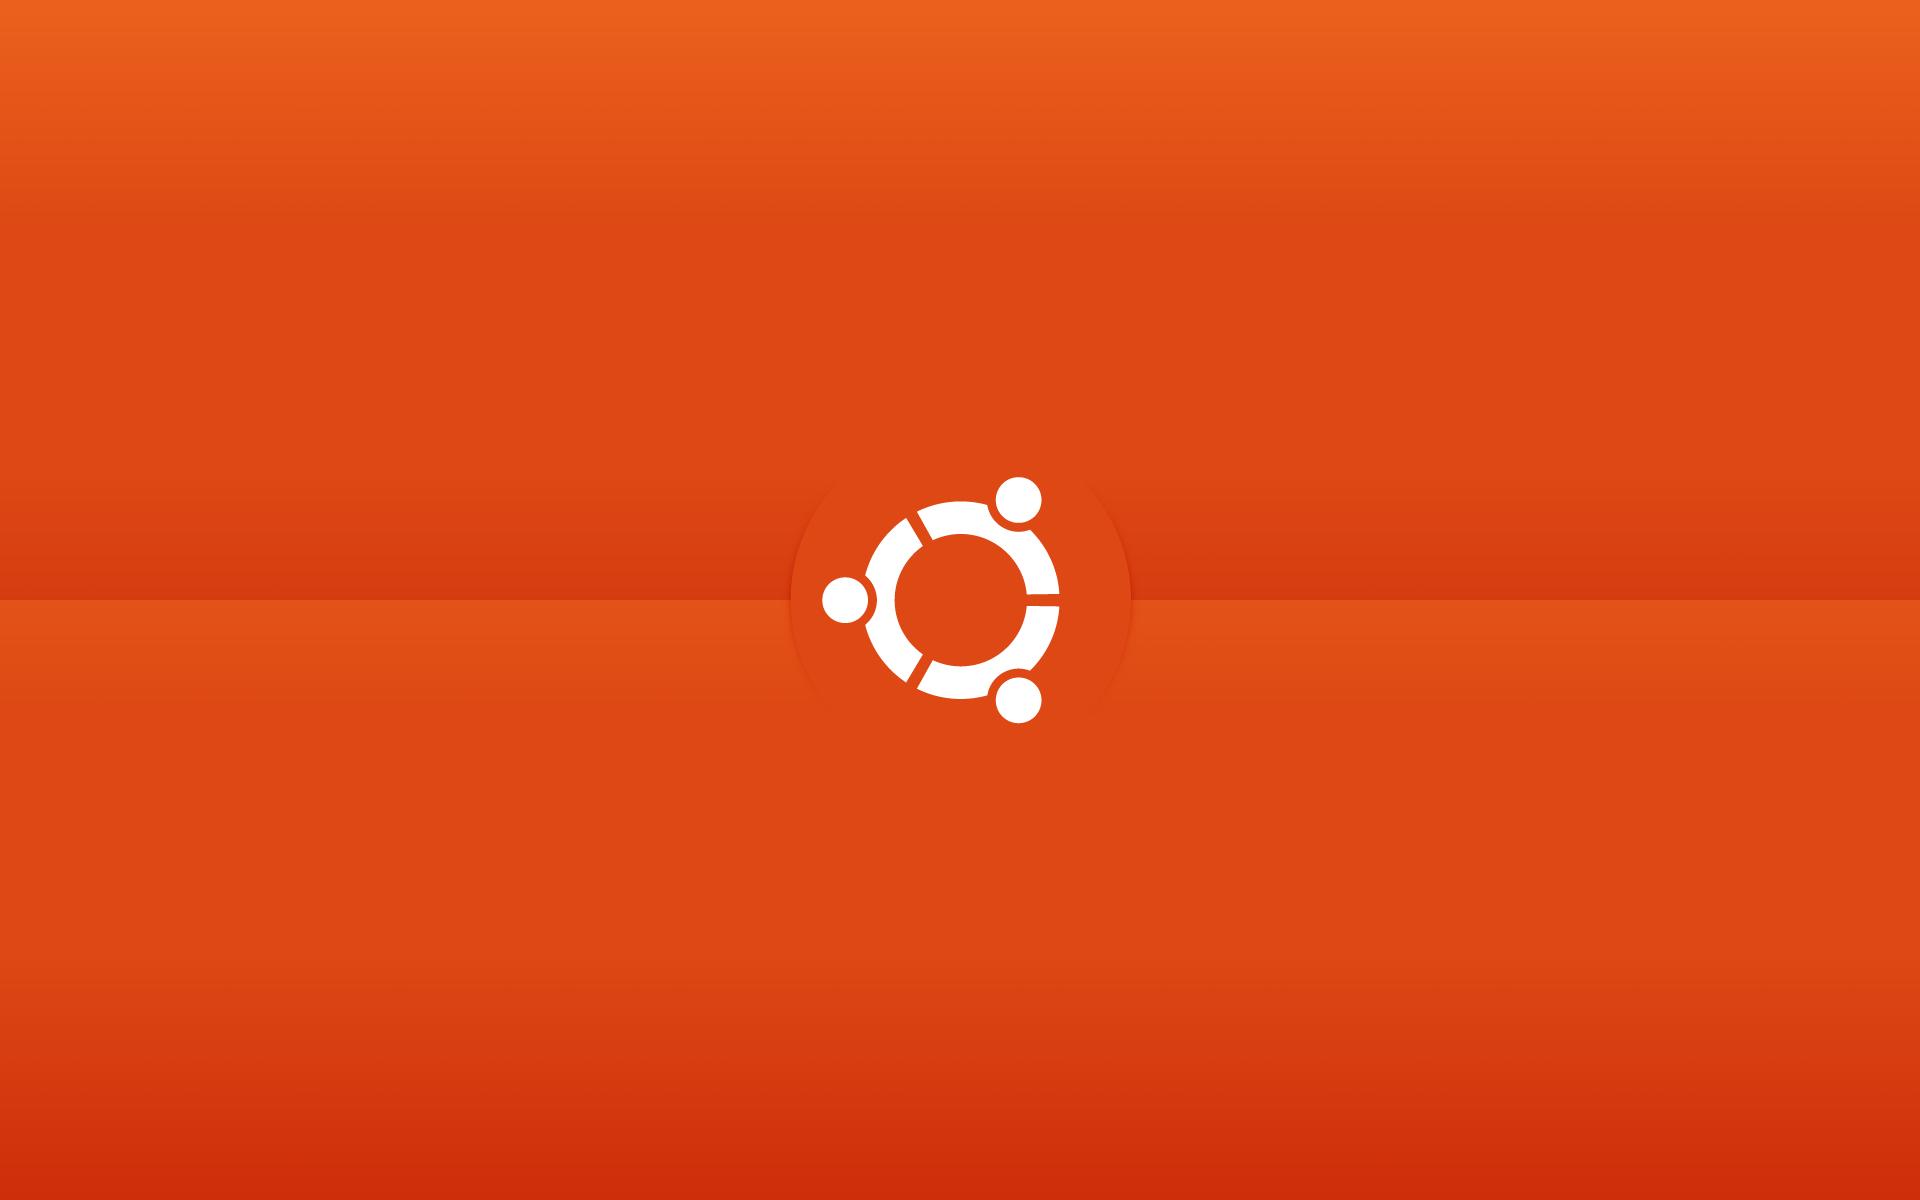 ubuntu minimalistic wallpaper by CajeFM